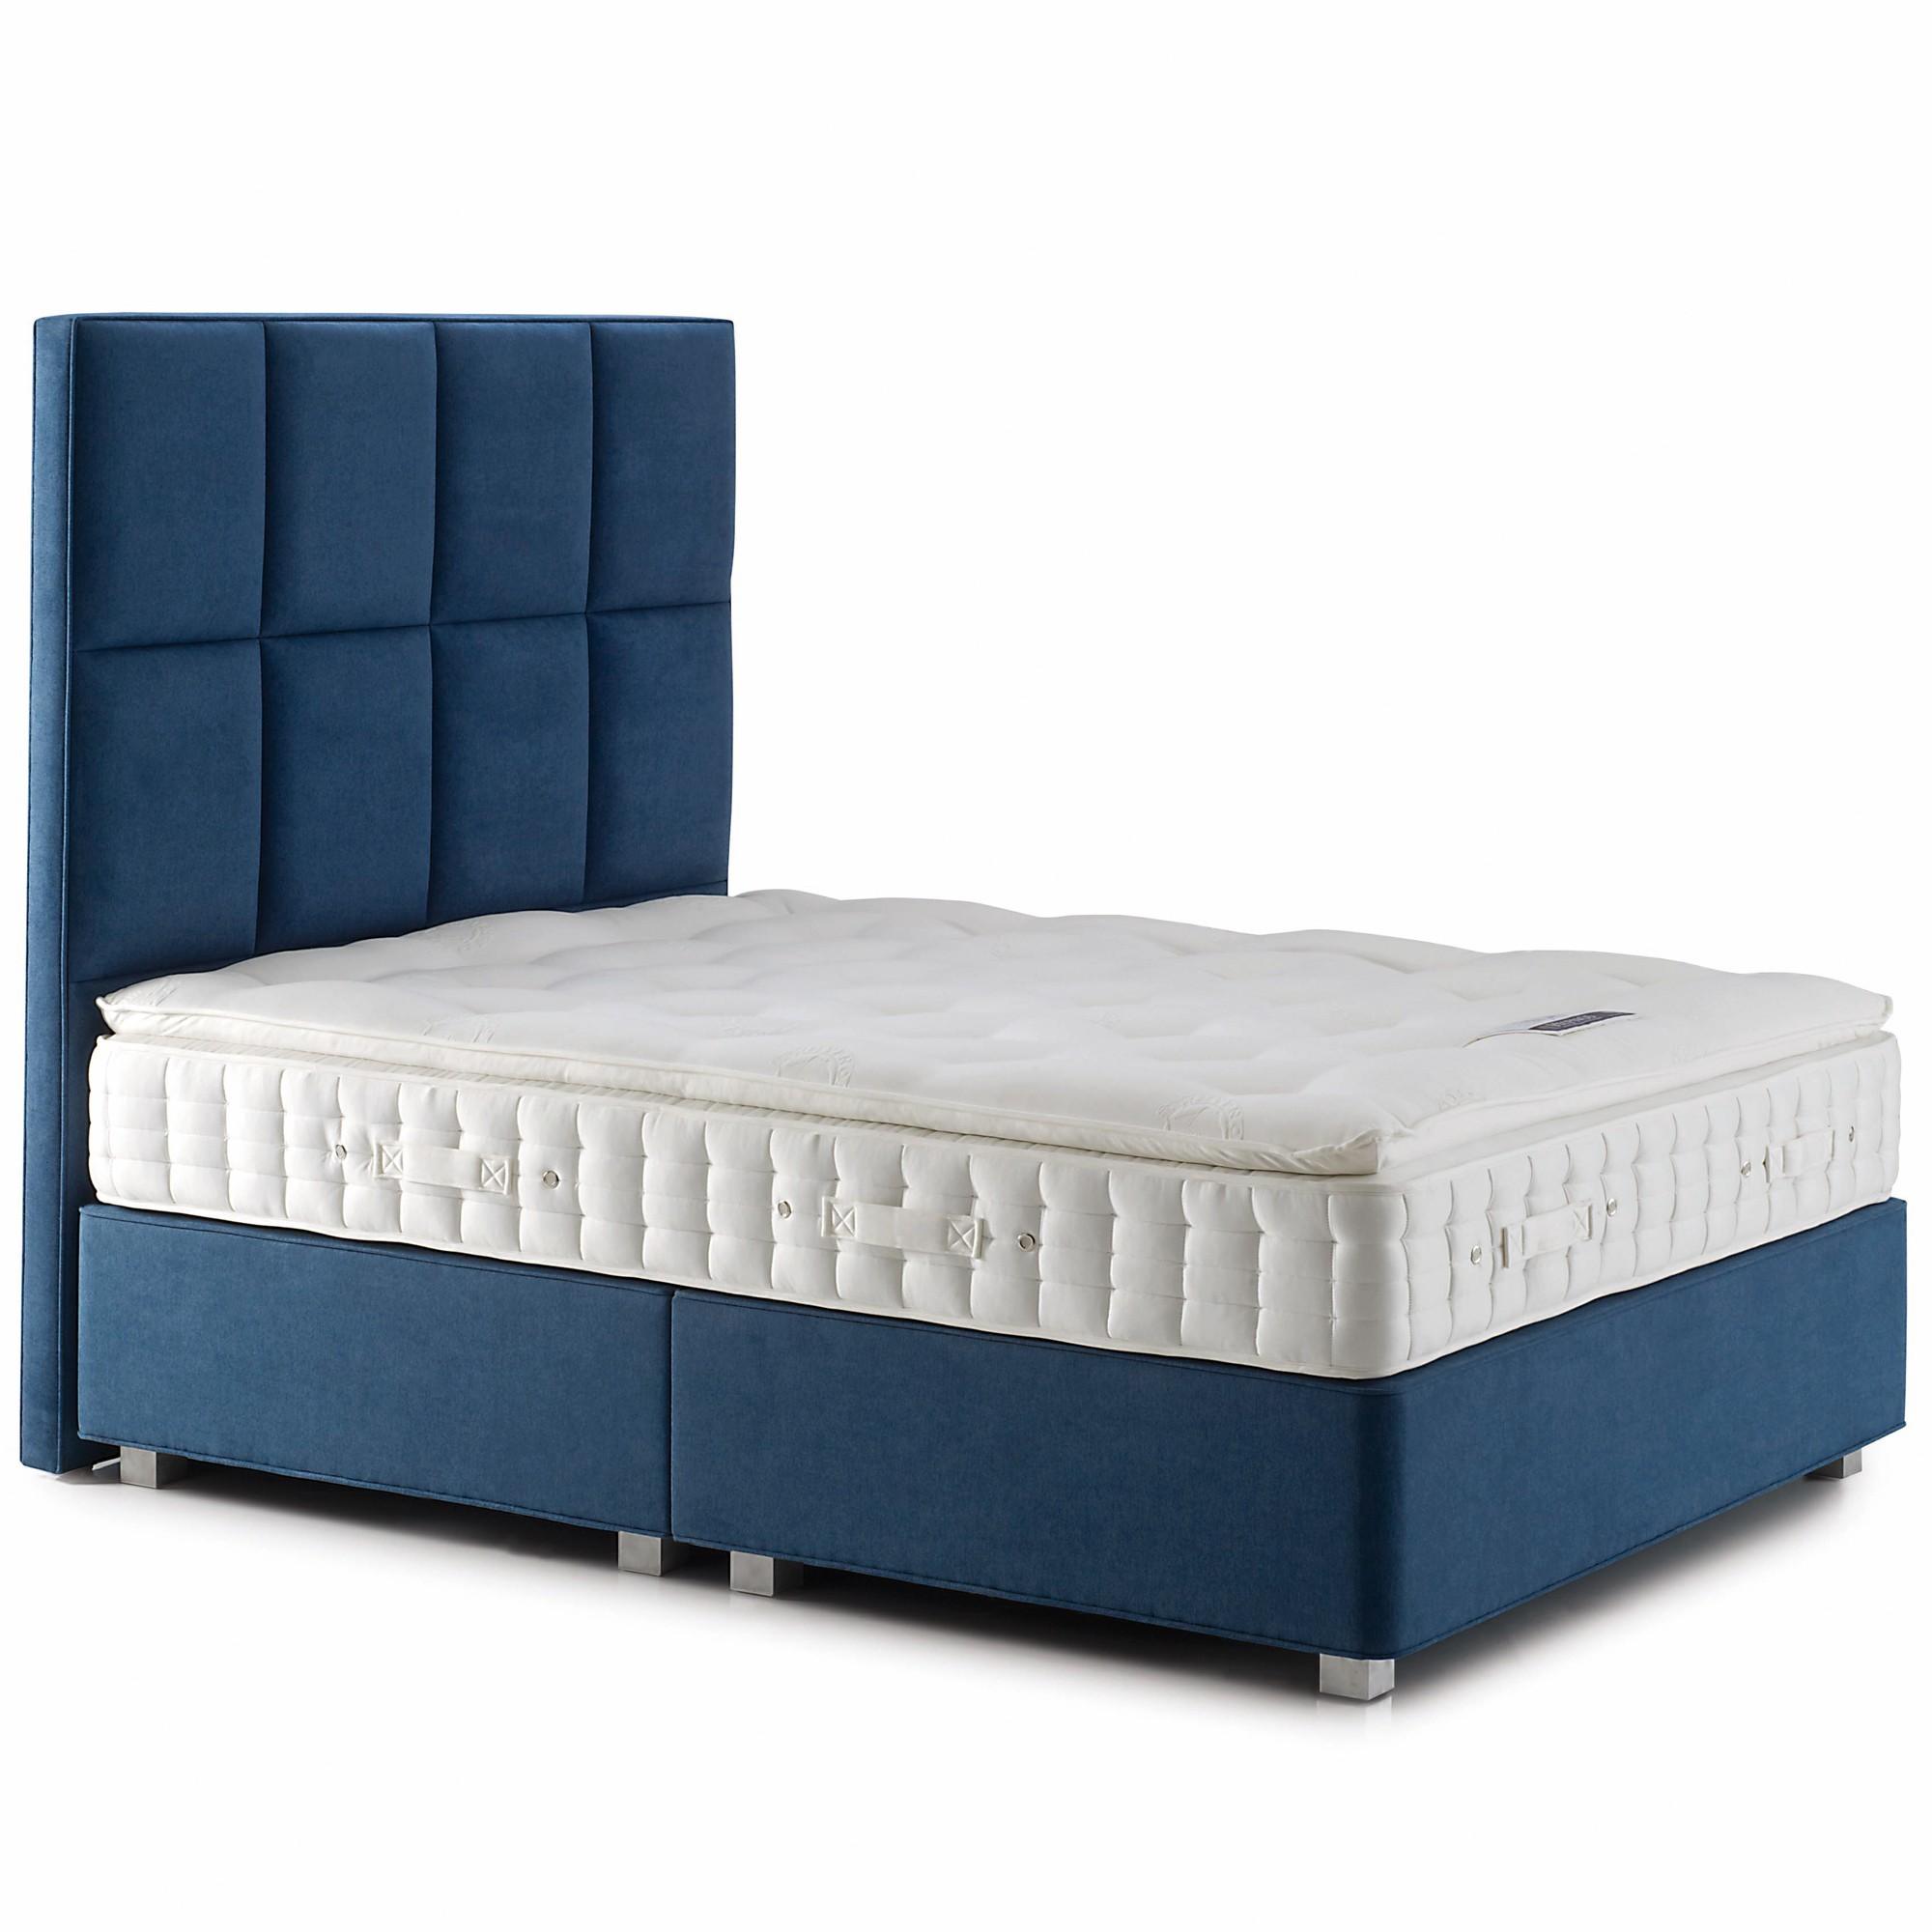 Hypnos pillow comfort alpaca deep pocket sprung edge divan for Pocket sprung divan